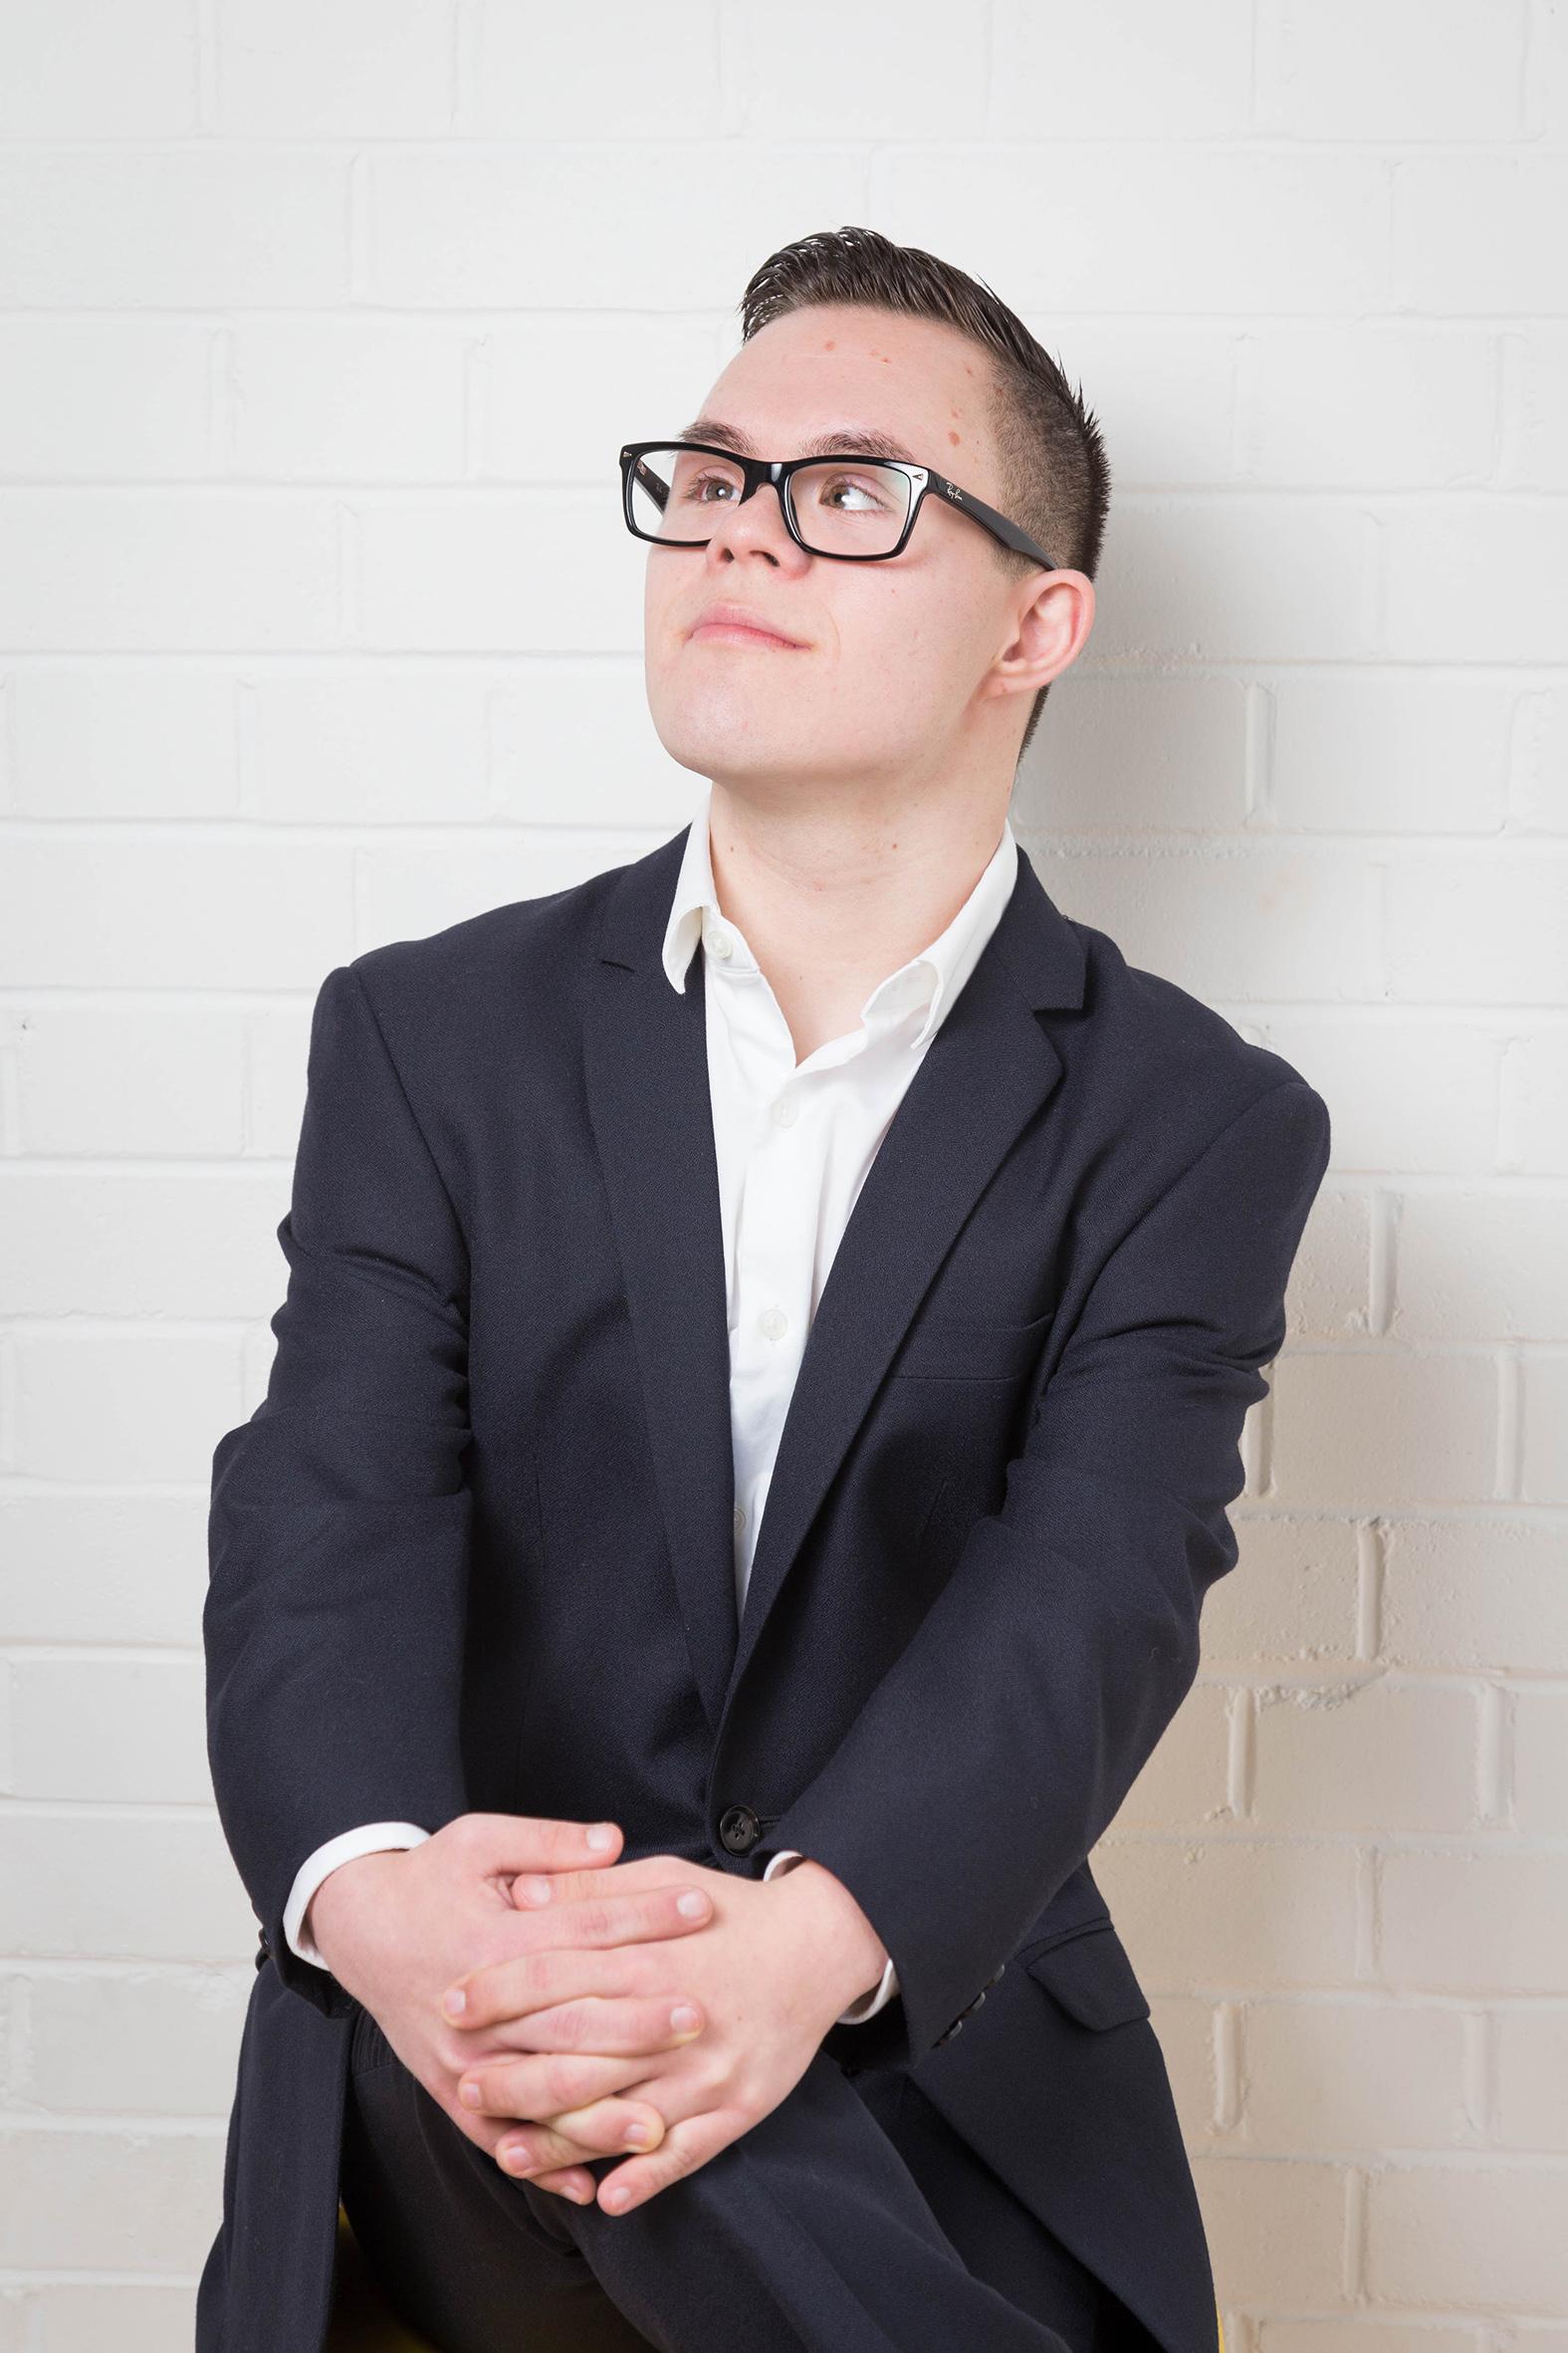 Sam, Down Syndrome model, Zebedee Management, disabled, model agency, disability, man 06